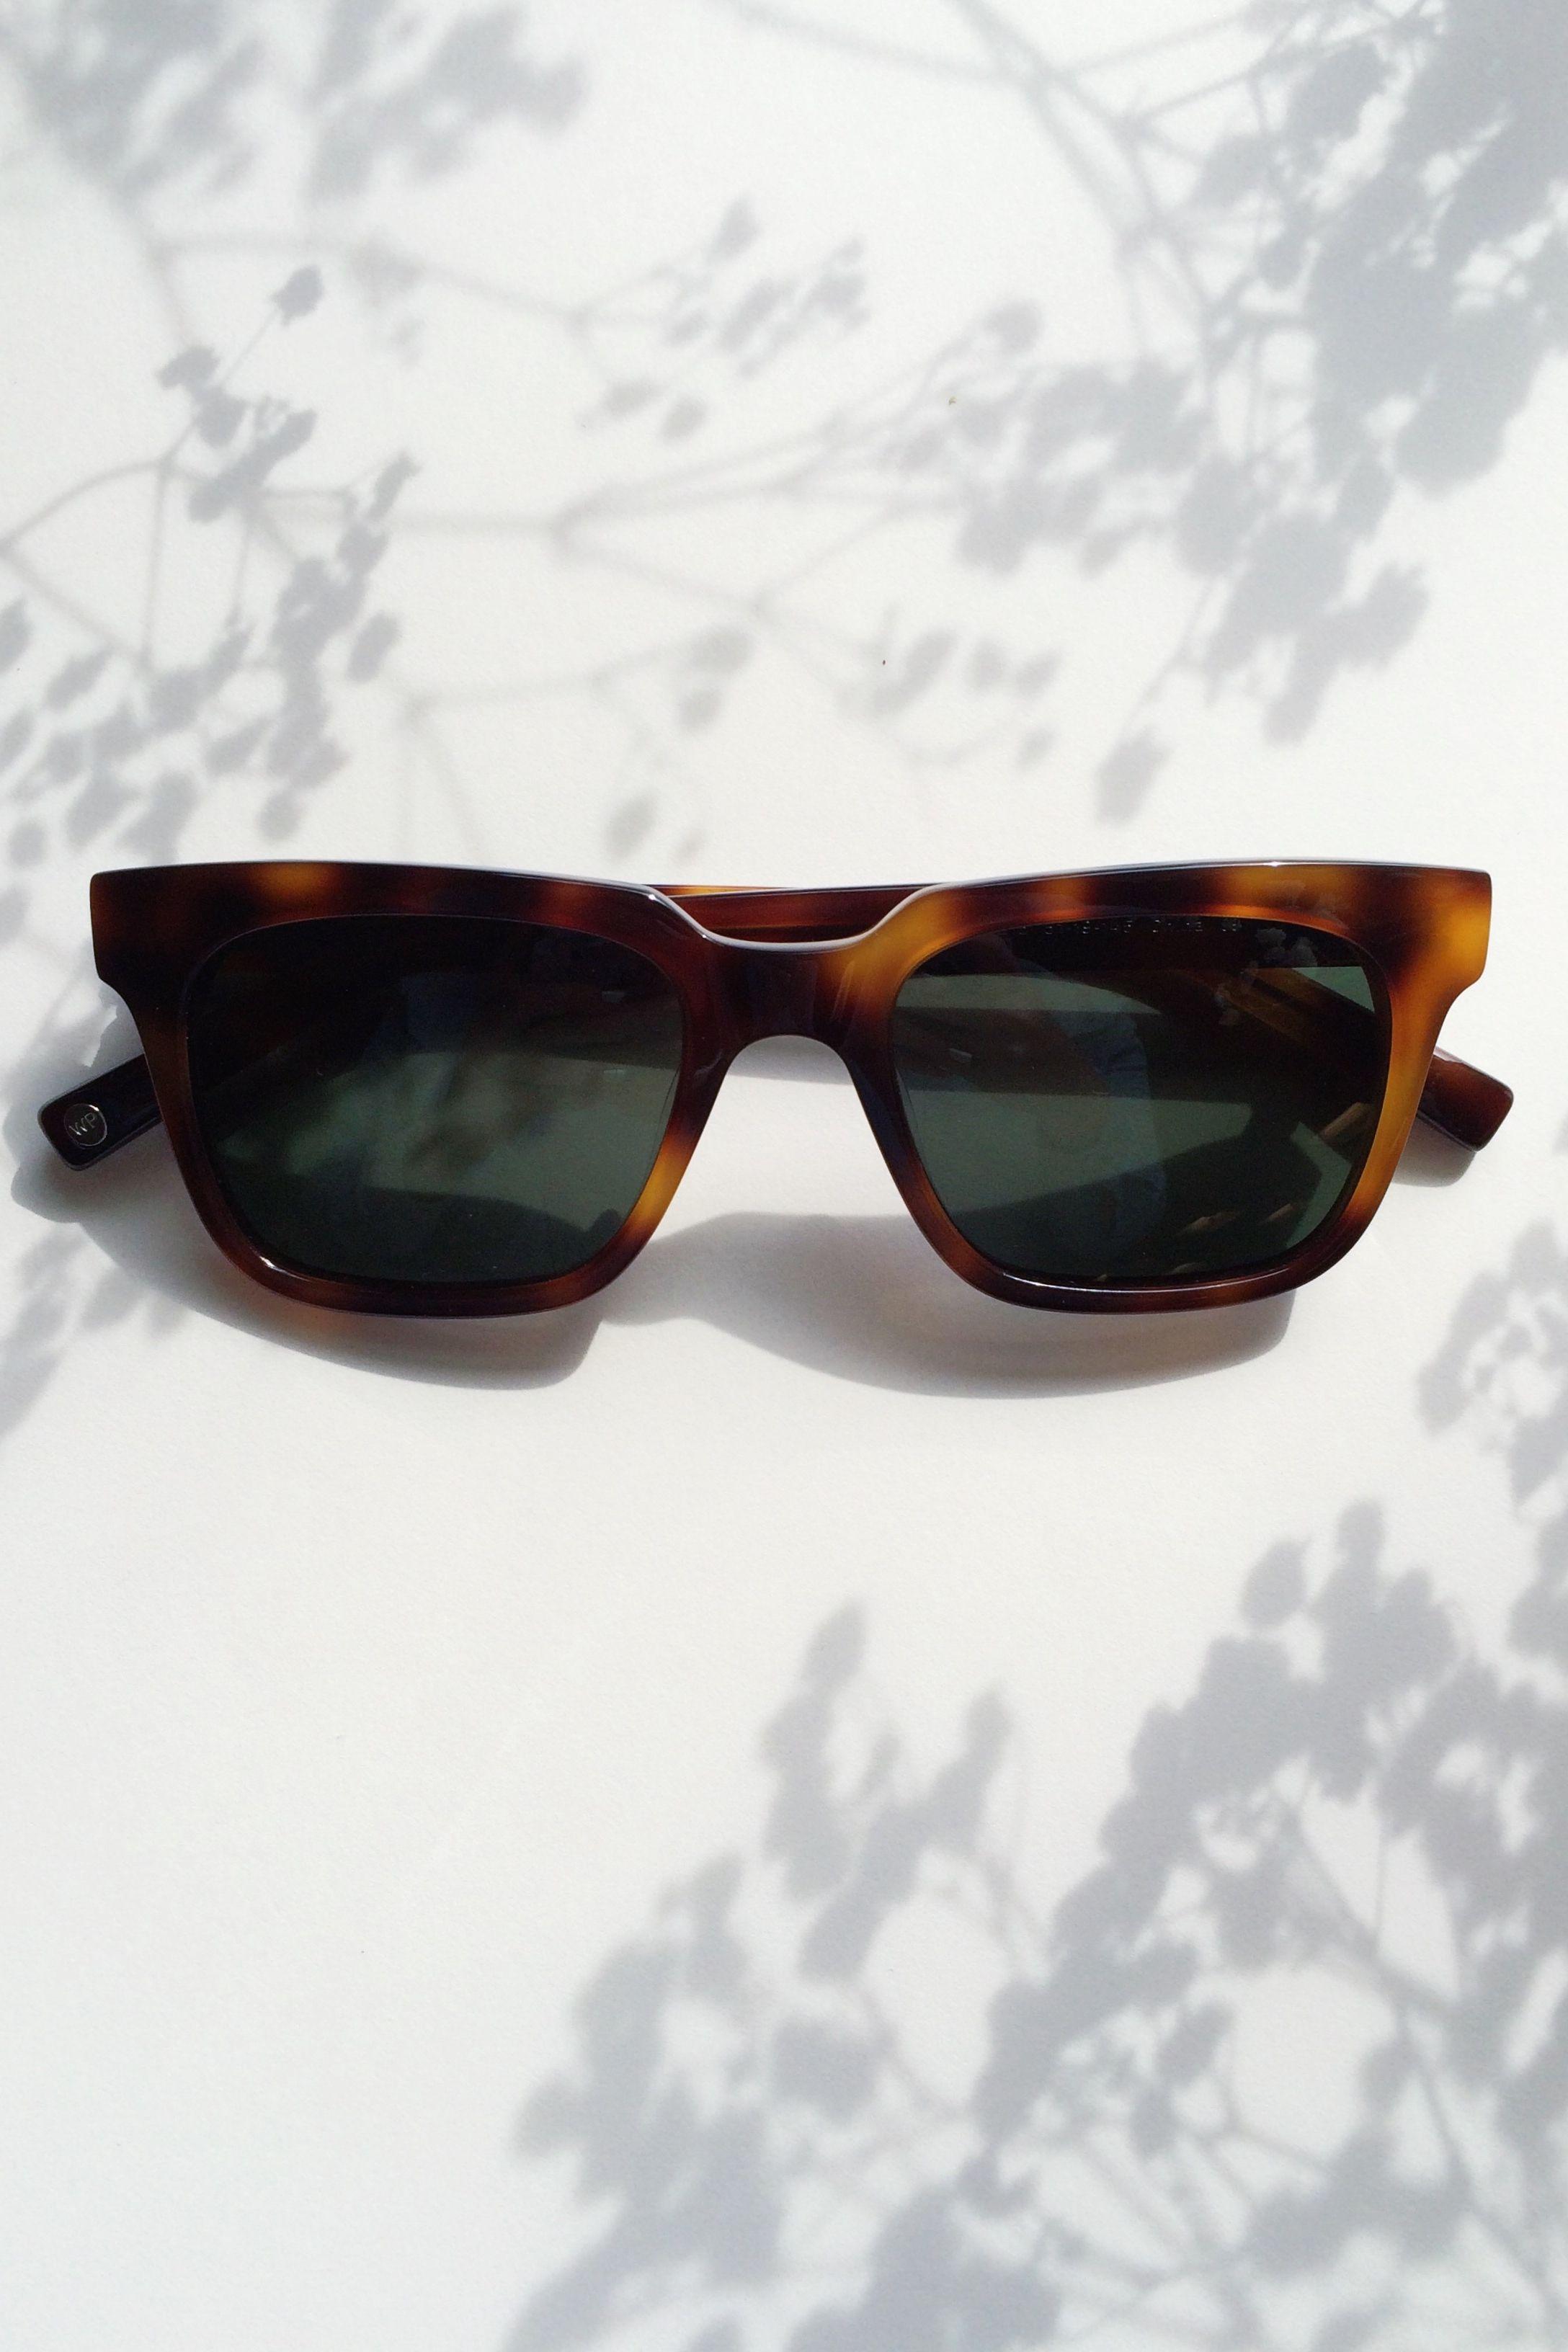 69bbd0d9b4a Jackson sunglasses in Woodgrain Tortoise  http   warby.me L5GwU ...